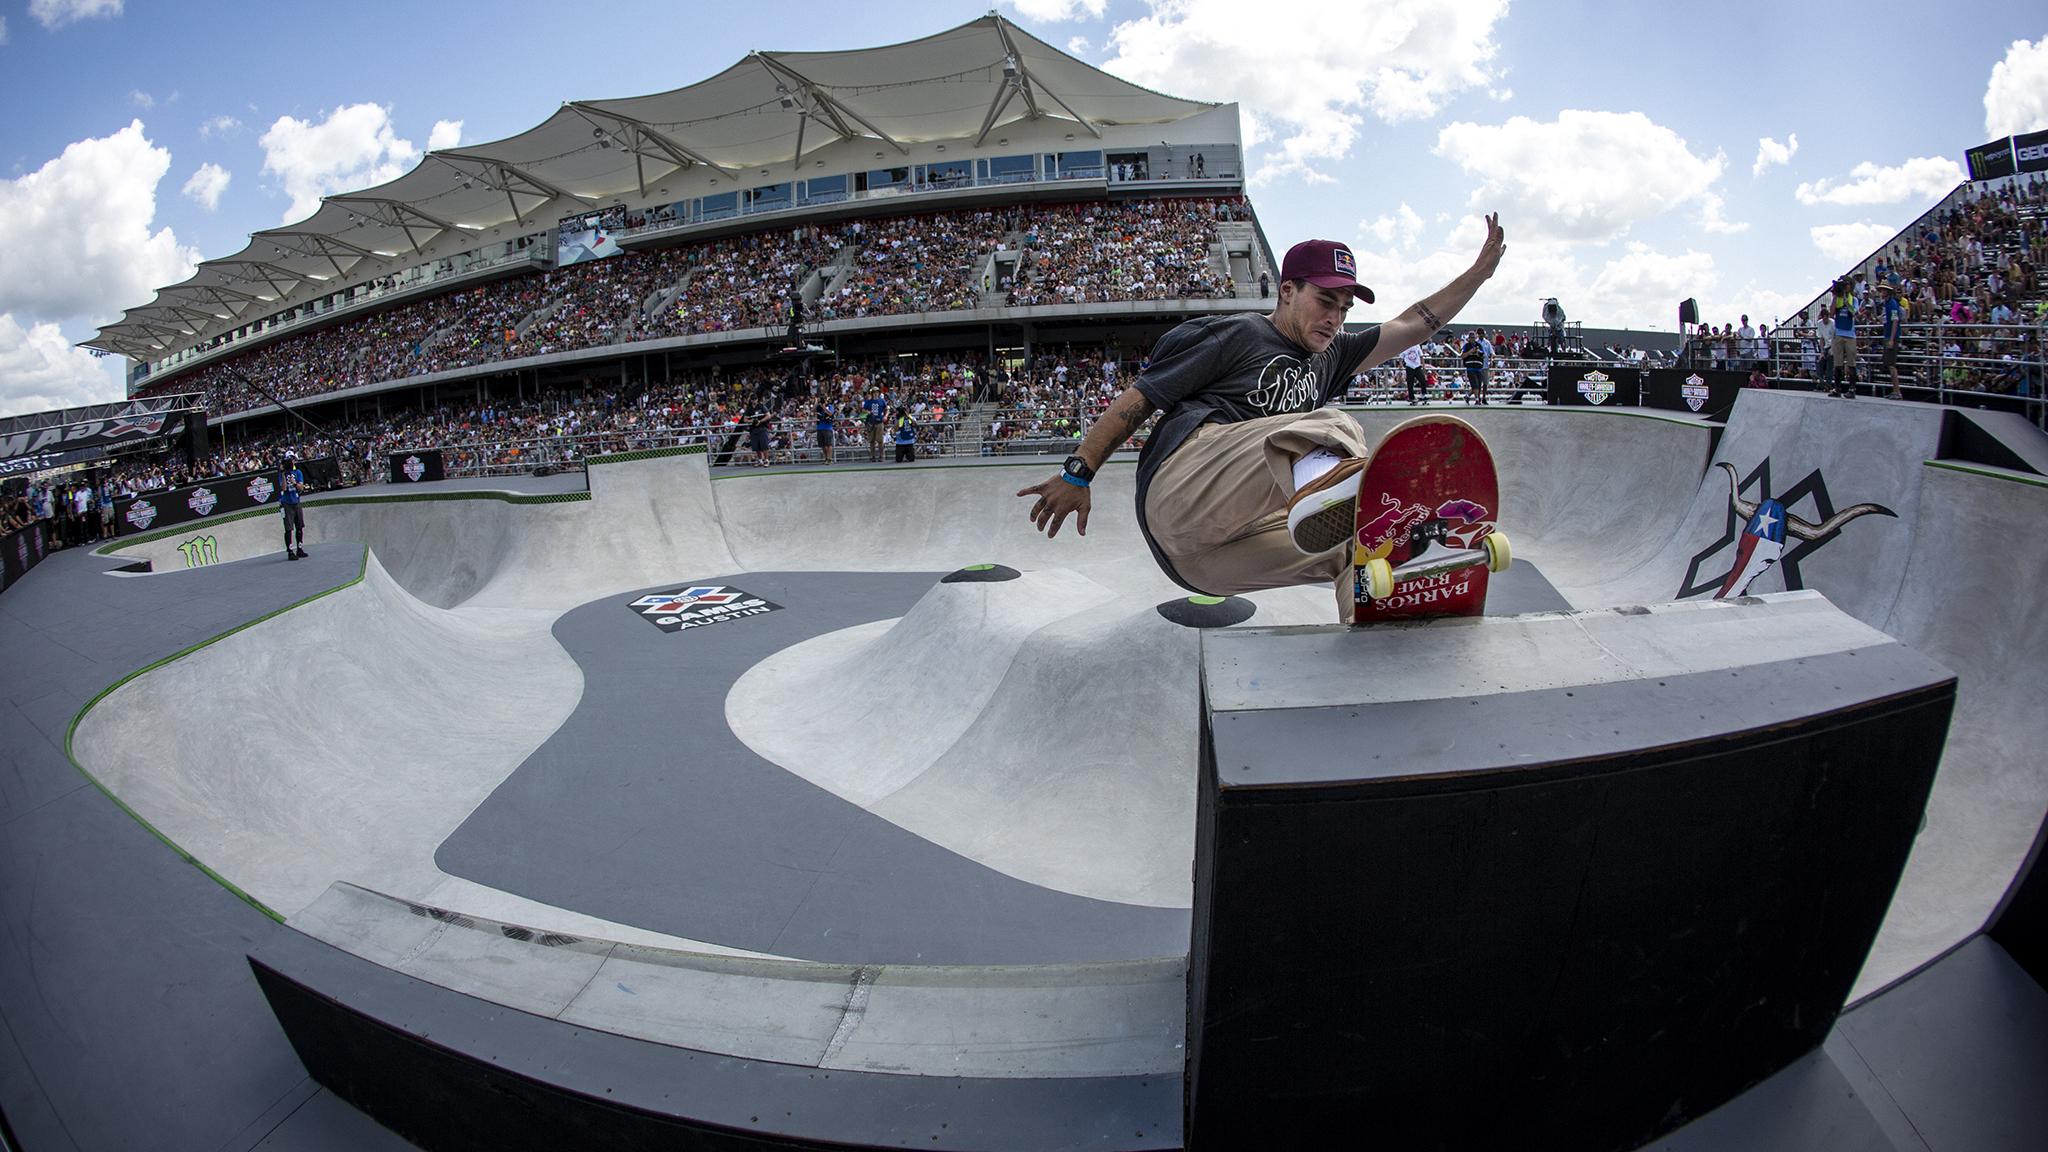 Skateboard Park -- Pedro Barros